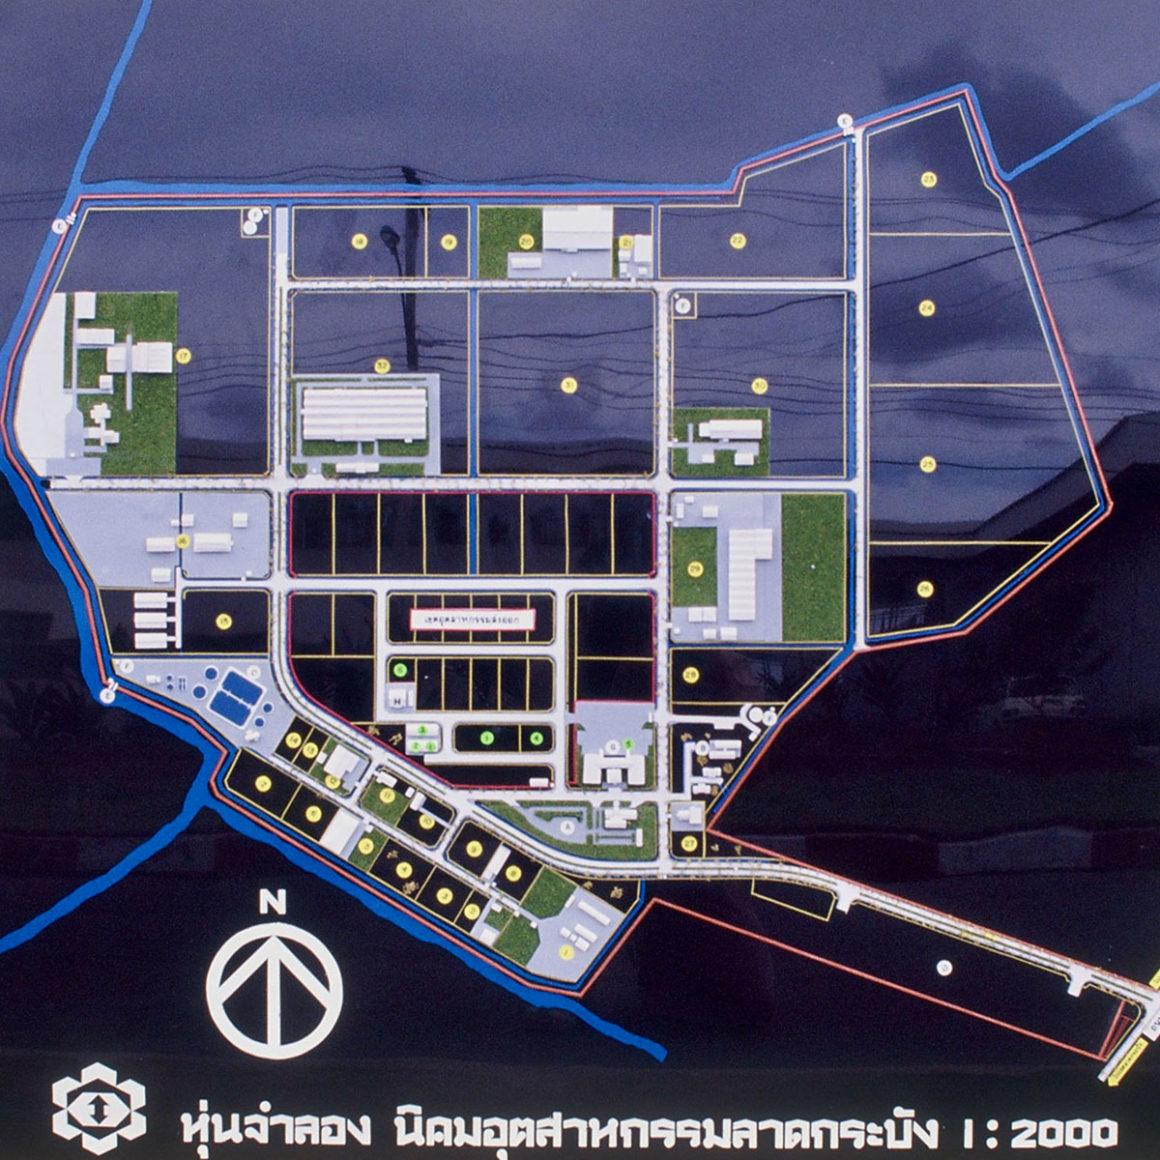 Industrial Estate: Ladkrabang Industrial Estate of IEAT